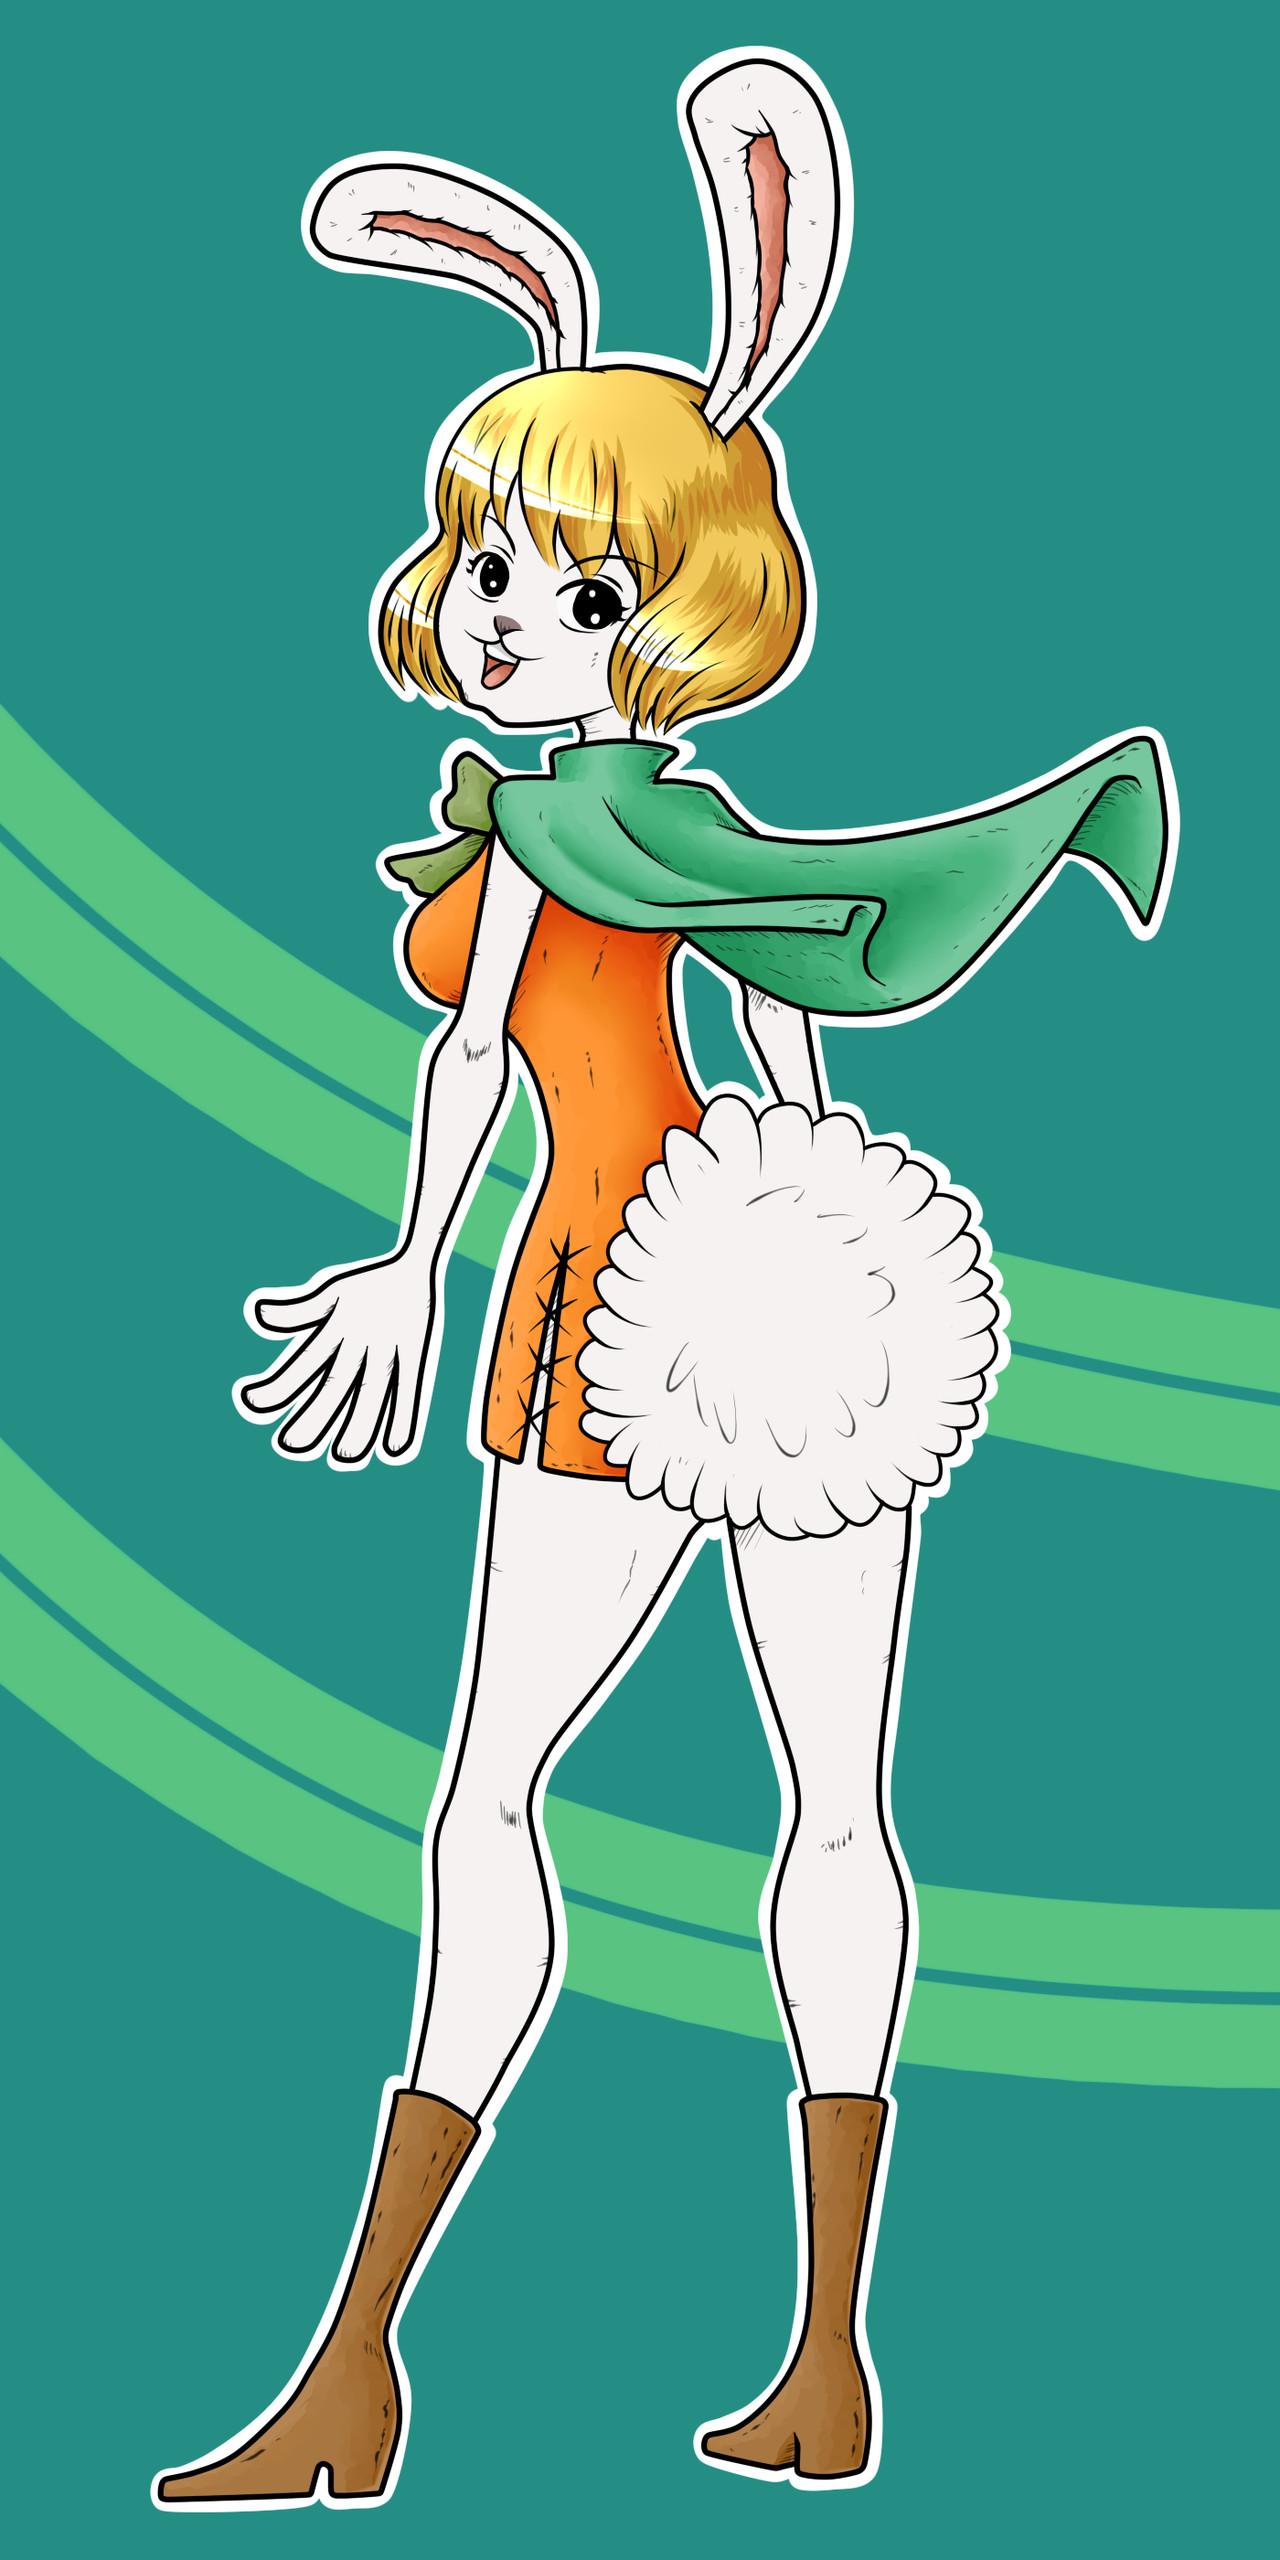 Carrot One Piece  e Piece Carrot by KarmaFez on DeviantArt